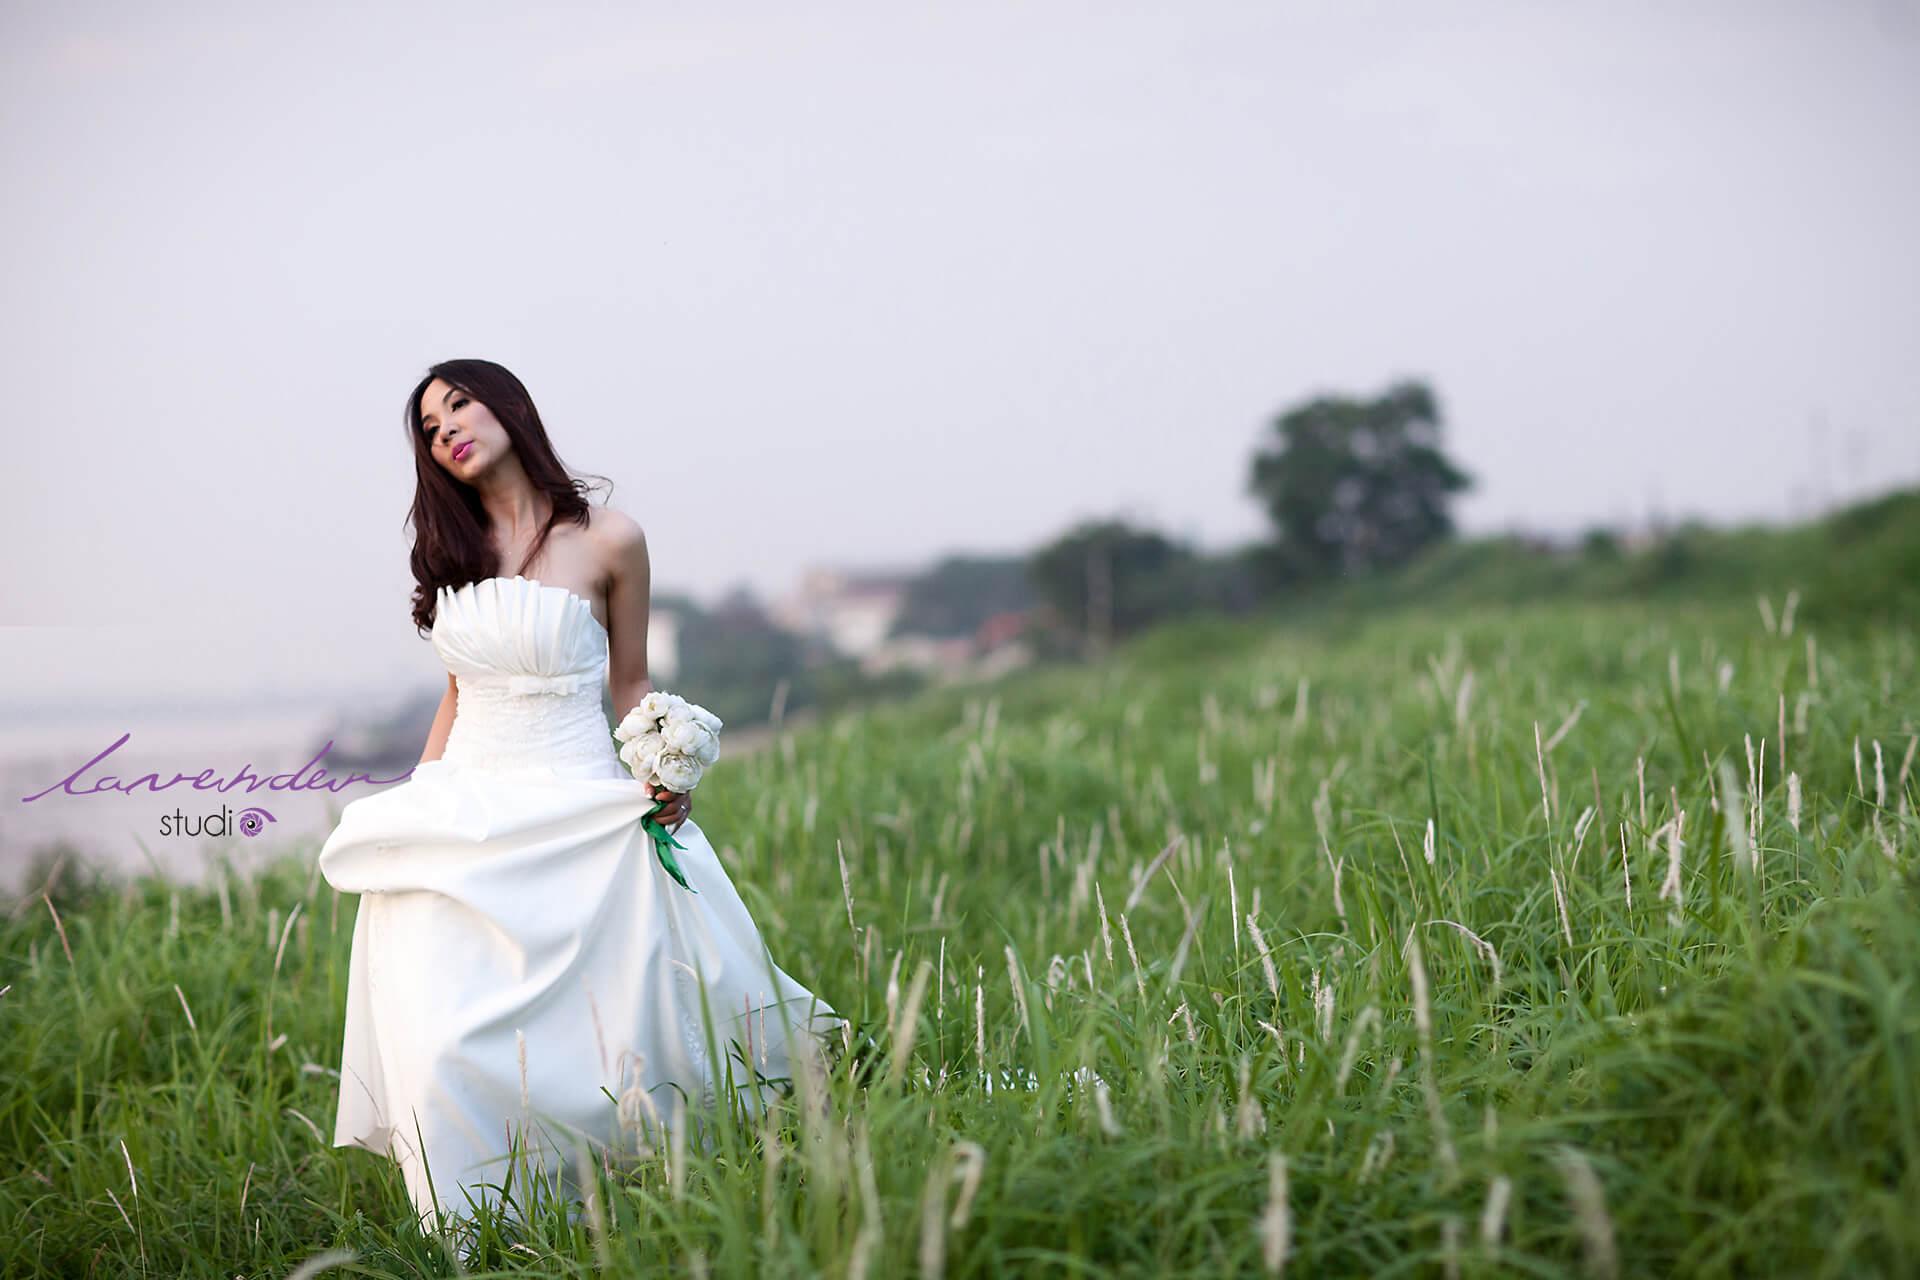 http://lavenderstudio.vn/wp-content/uploads/img_6829-copy.jpg